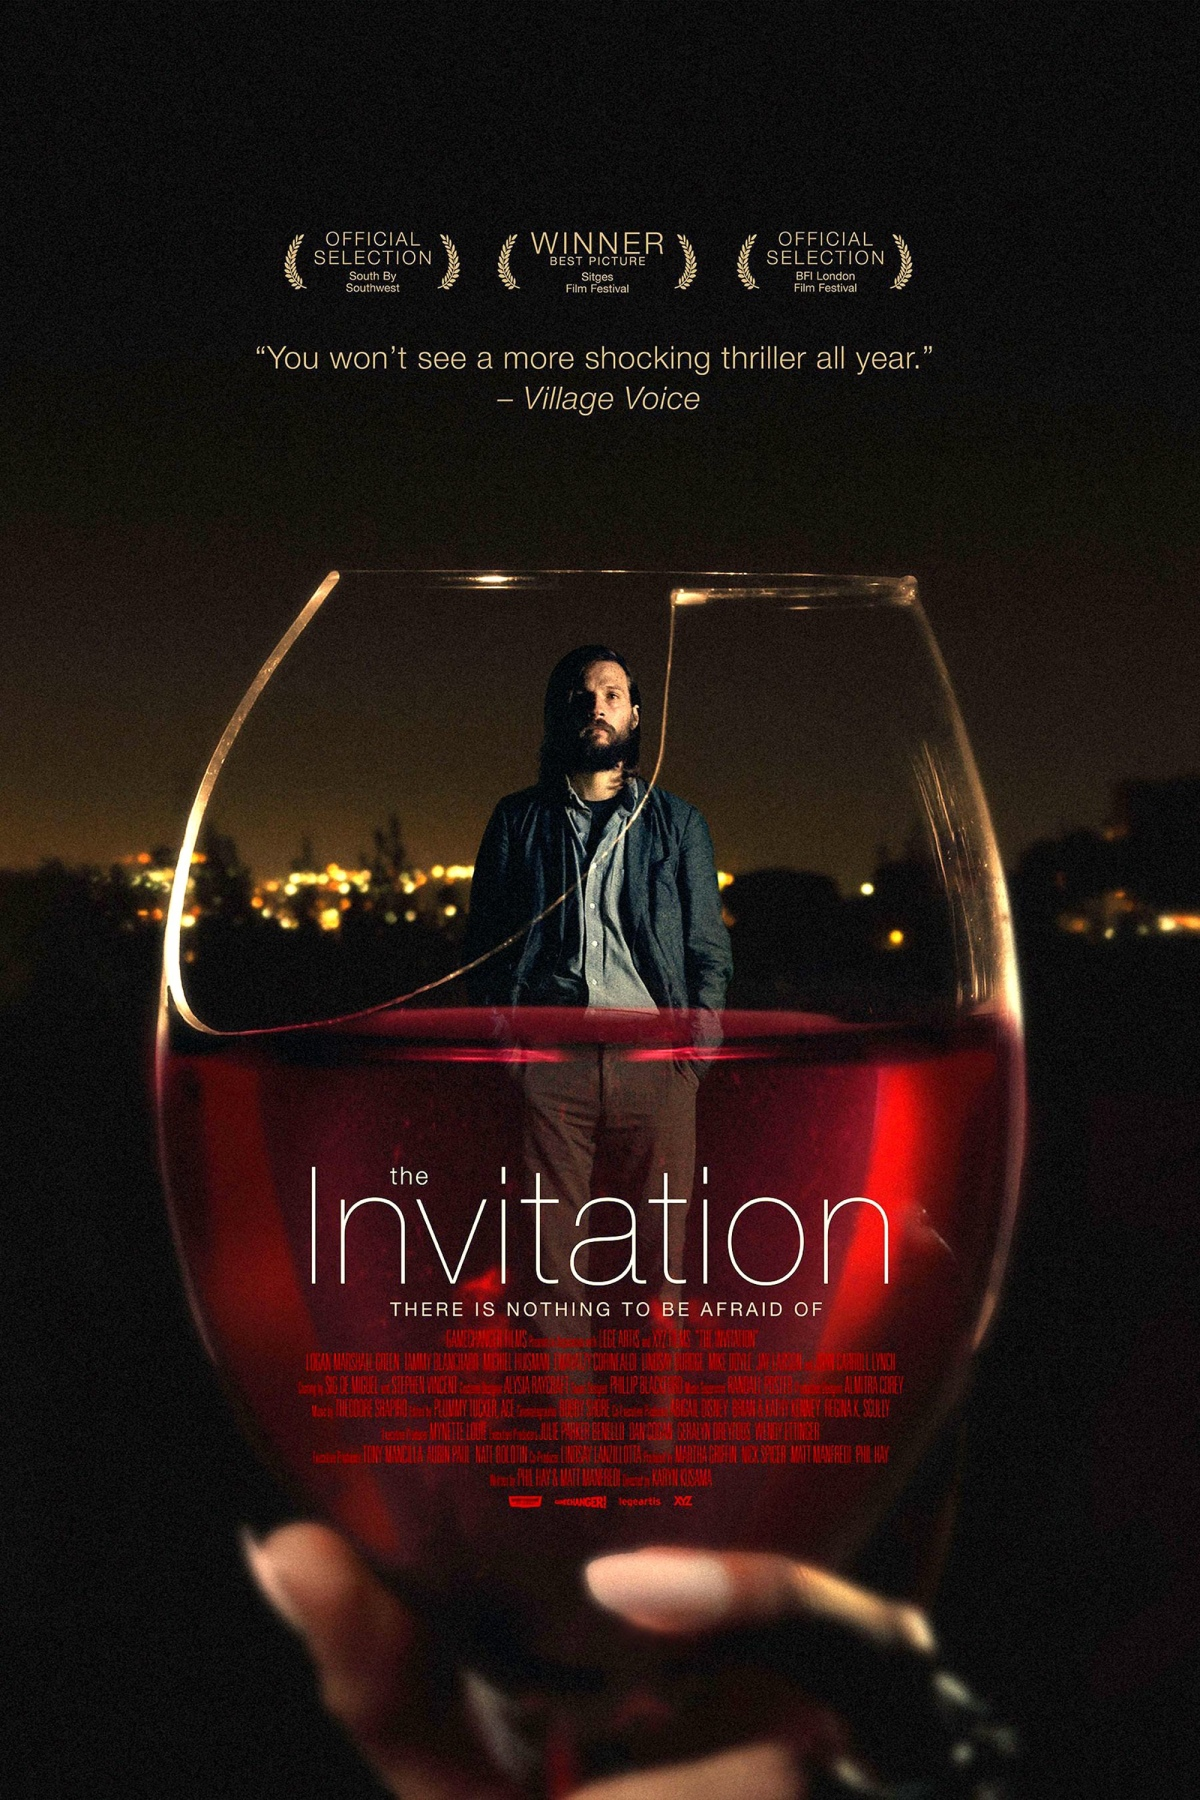 The Invitation (2018, Dir. KarynKusama)